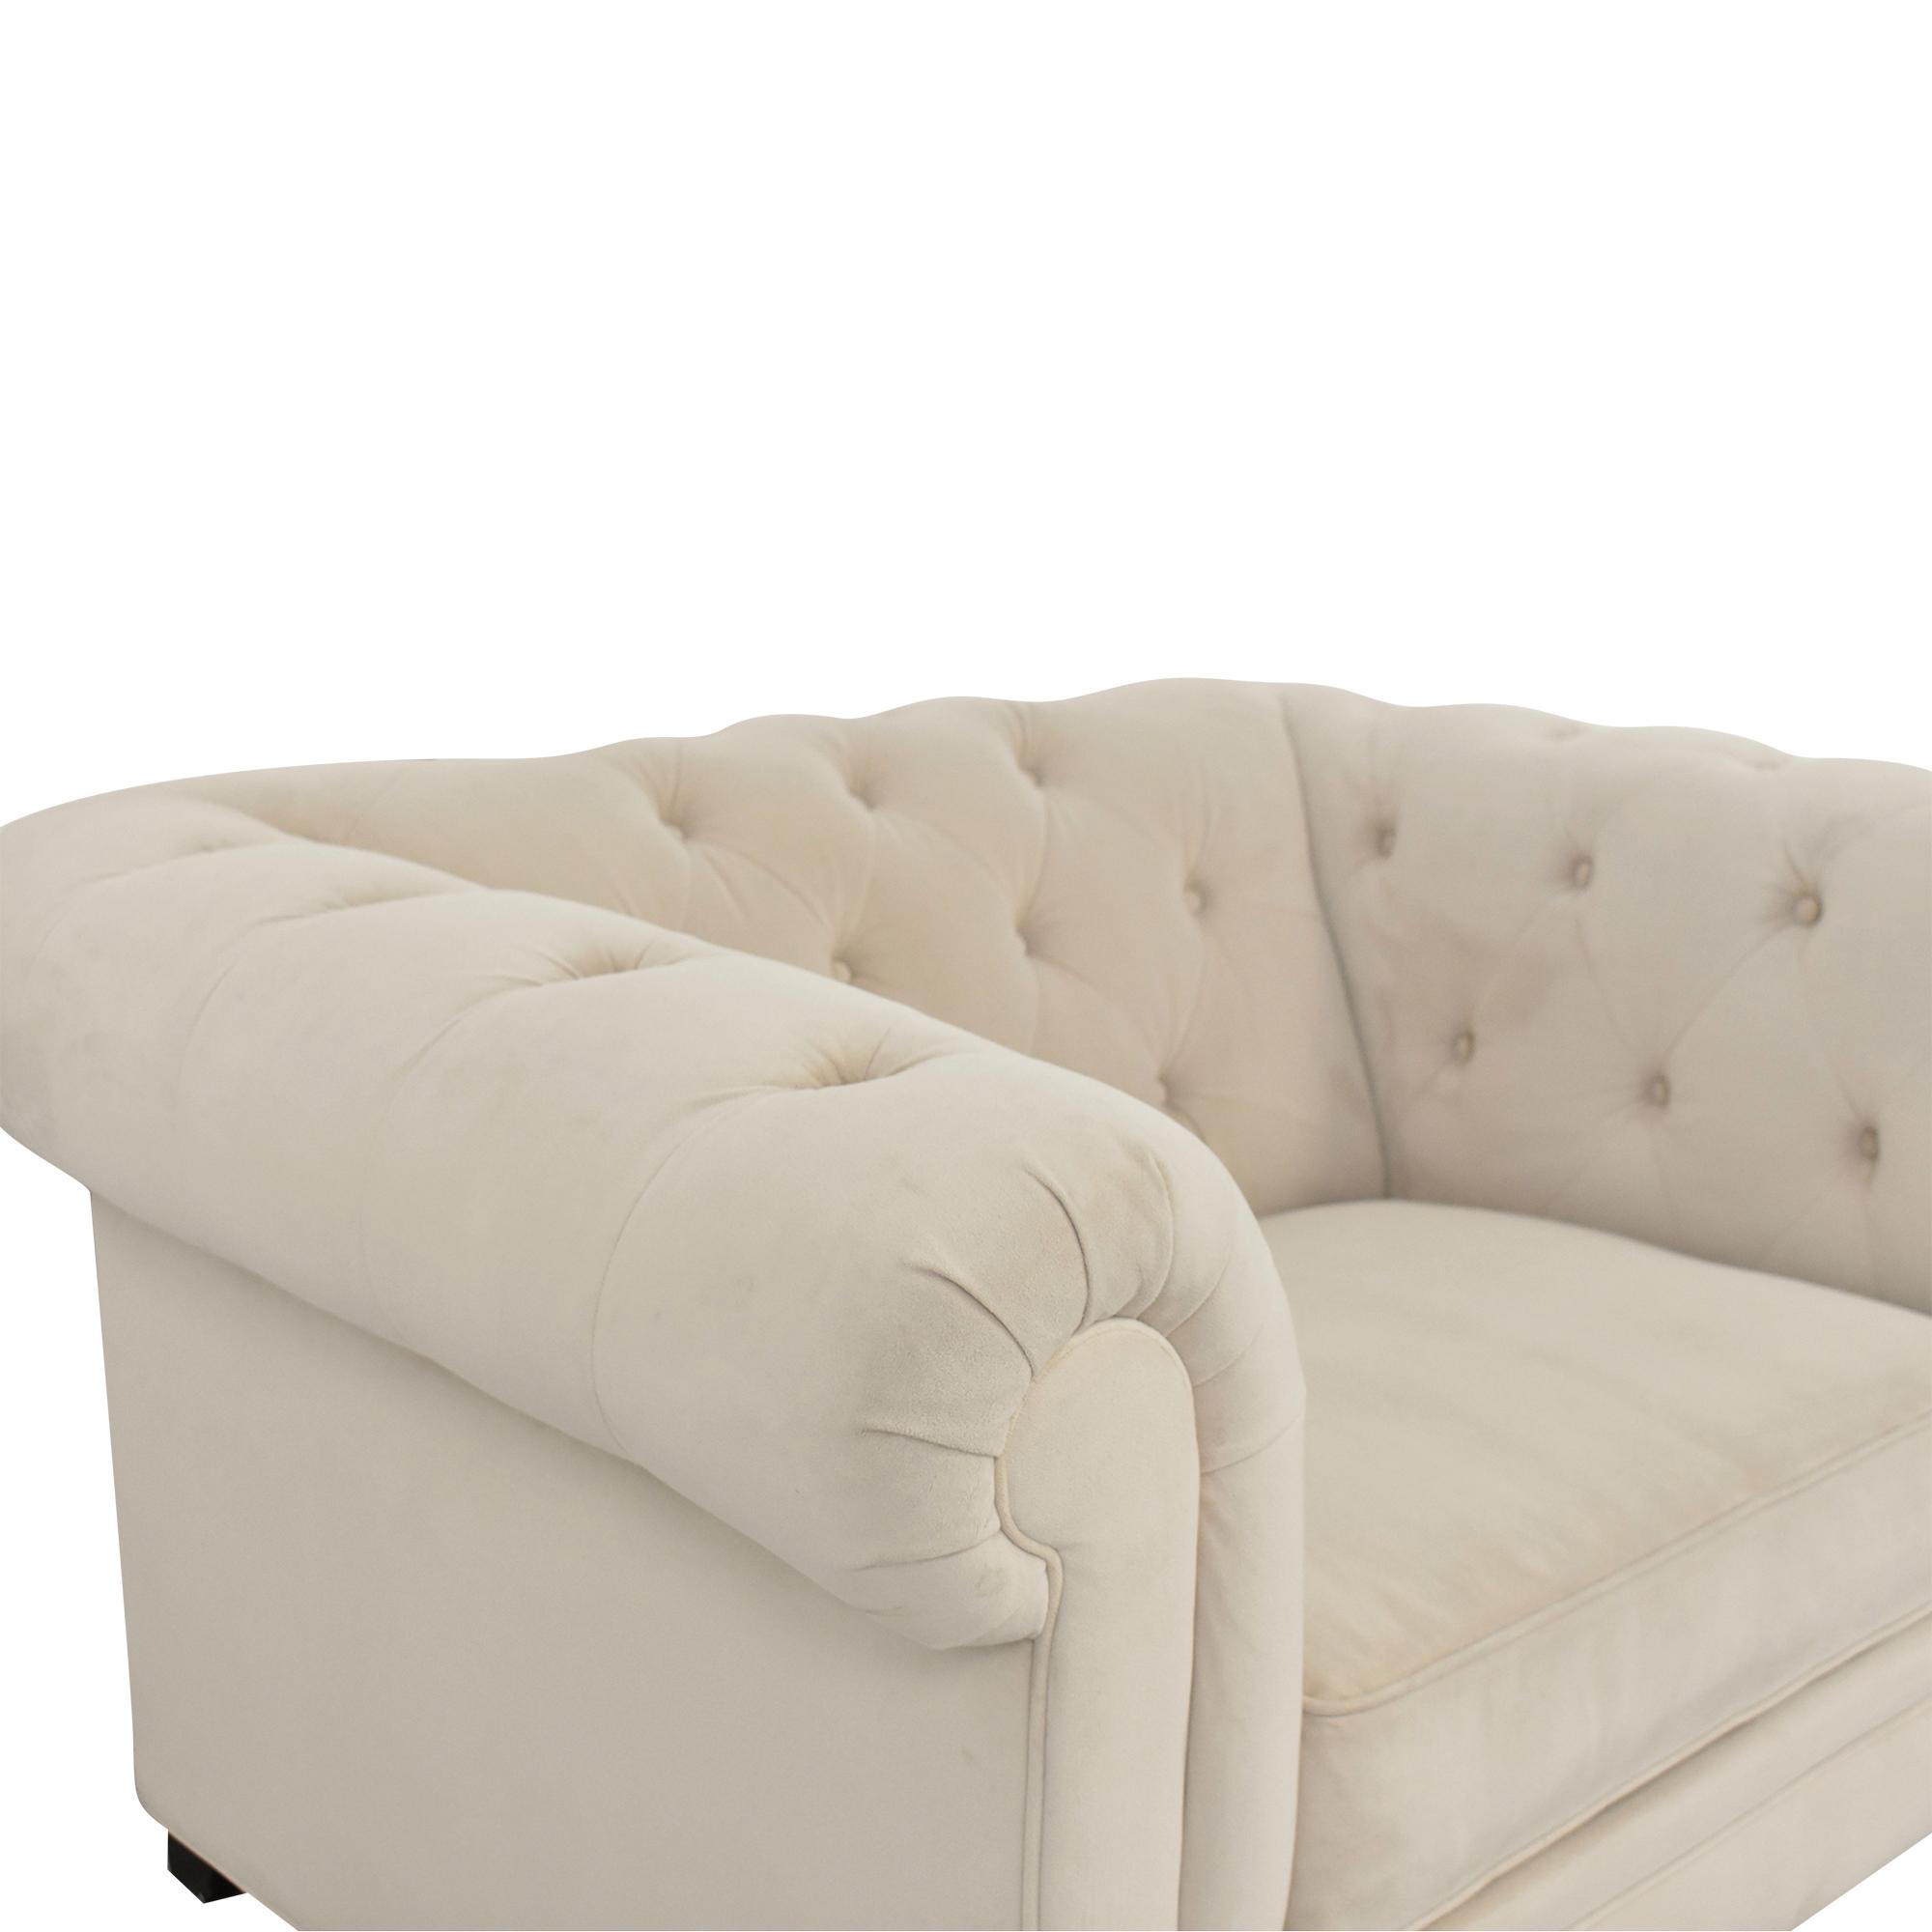 Macy's Macy's Martha Stewart Collection Saybridge Arm Chair Chairs